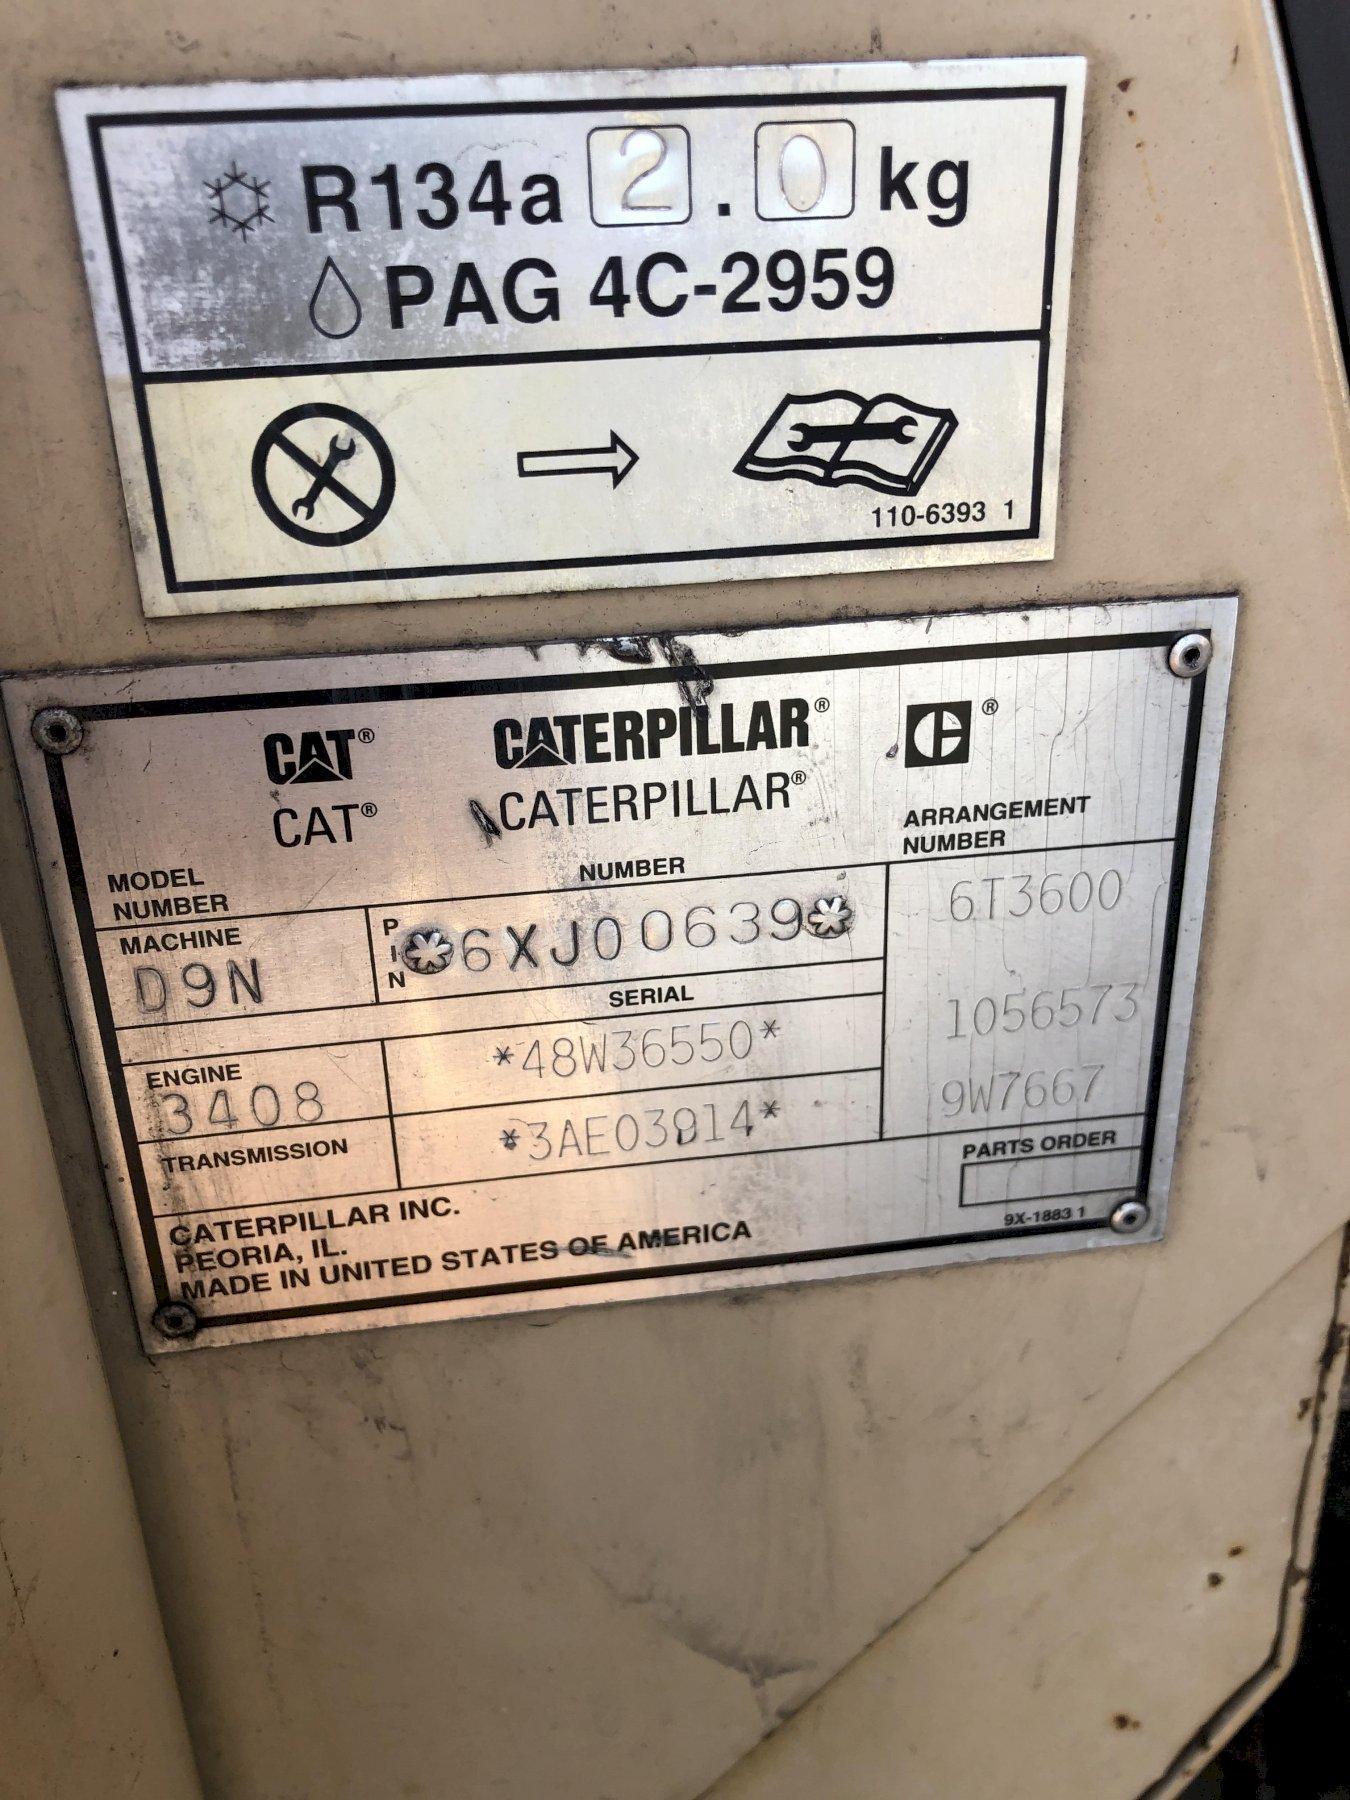 Caterpillar model d9n track mounted bulldozer s/n 6xj00639 with balderson 3wl model bd9u19 blade s/n 15470, 3408 engine s/n 48w36550, 14846 hours